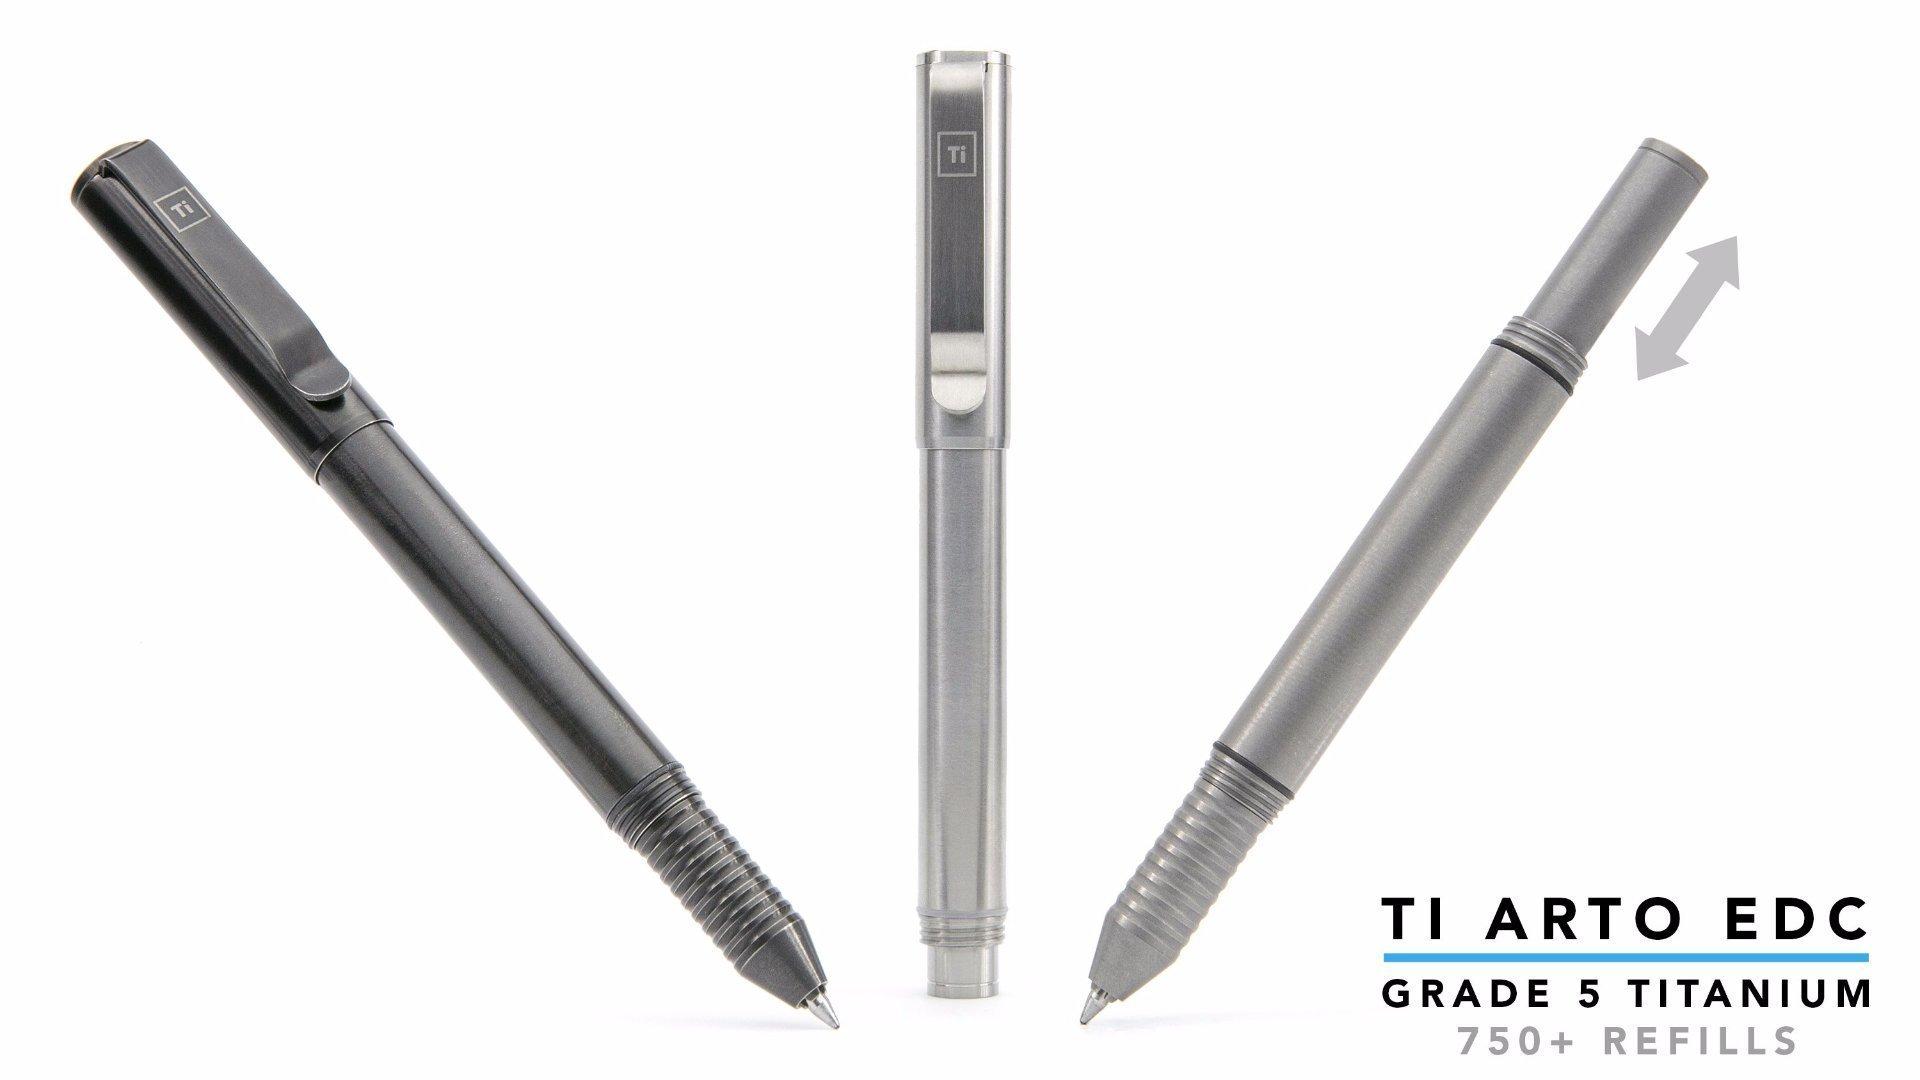 BIG IDEA DESIGN Ti Arto EDC : The Ultimate Refill Friendly Everyday Carry Pen (Stonewashed) by BIG IDEA DESIGN (Image #5)